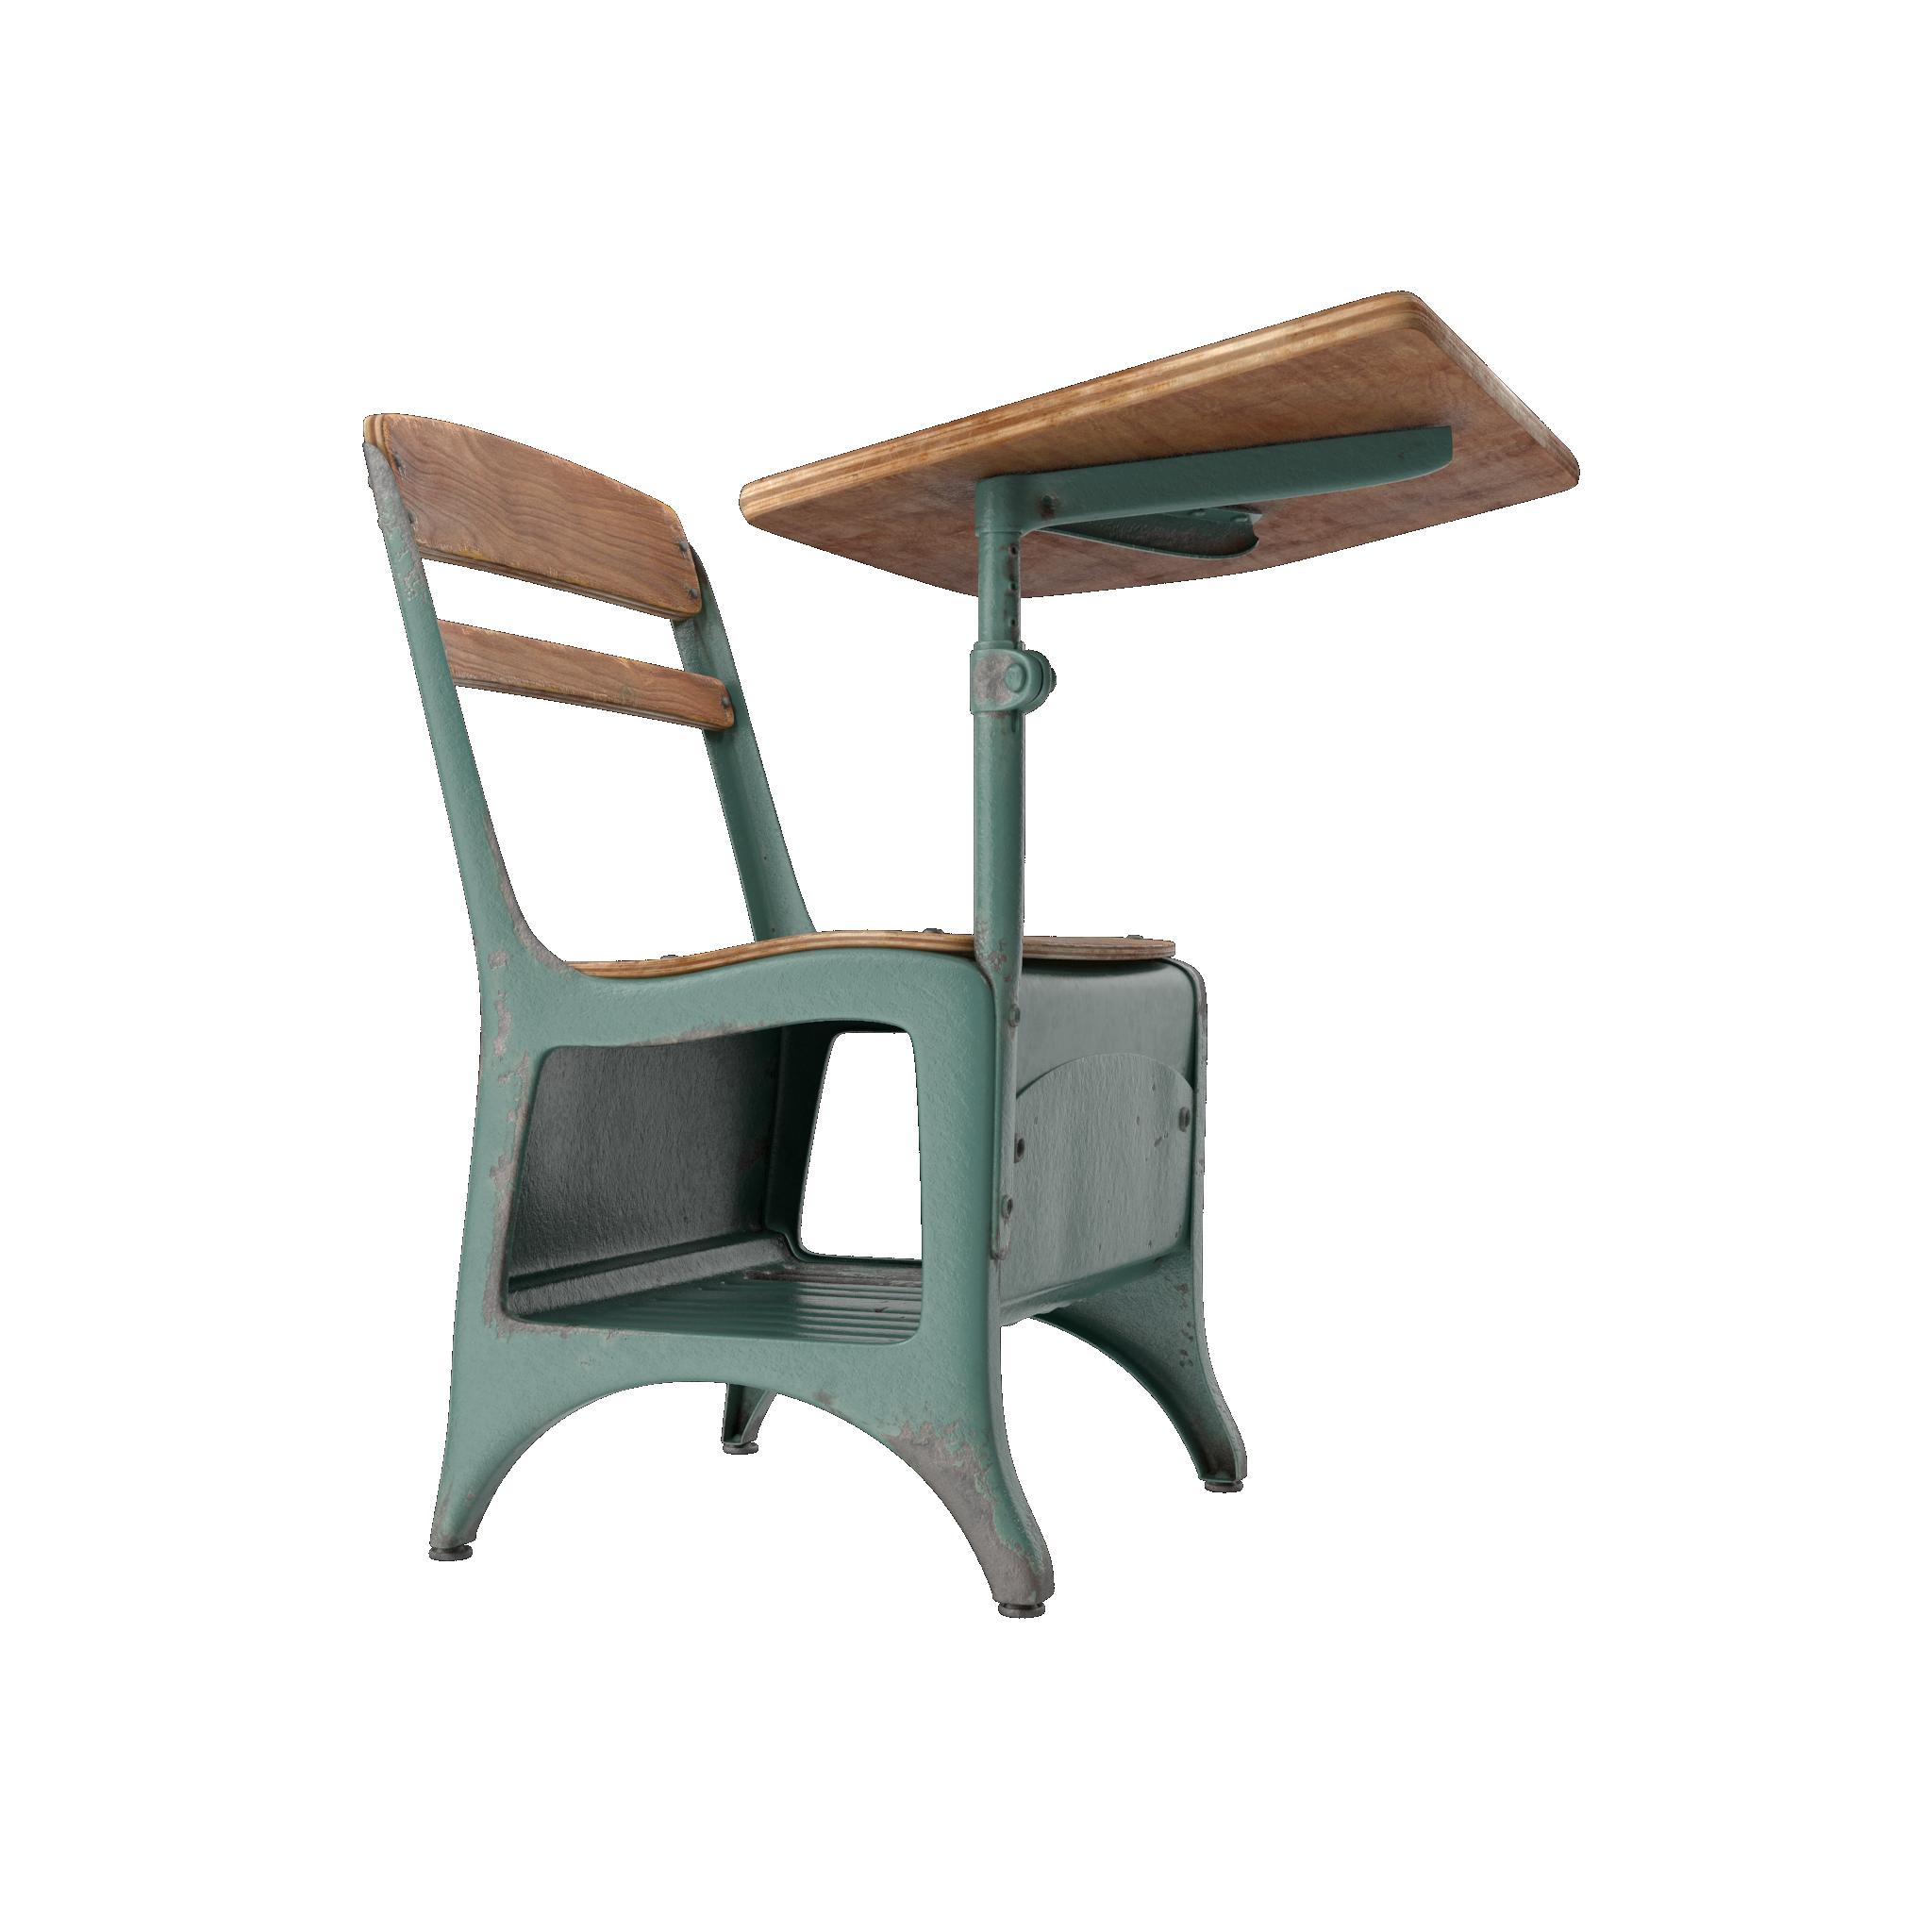 Antique School Desk Png Image Purepng Free Transpa Cc0 Library